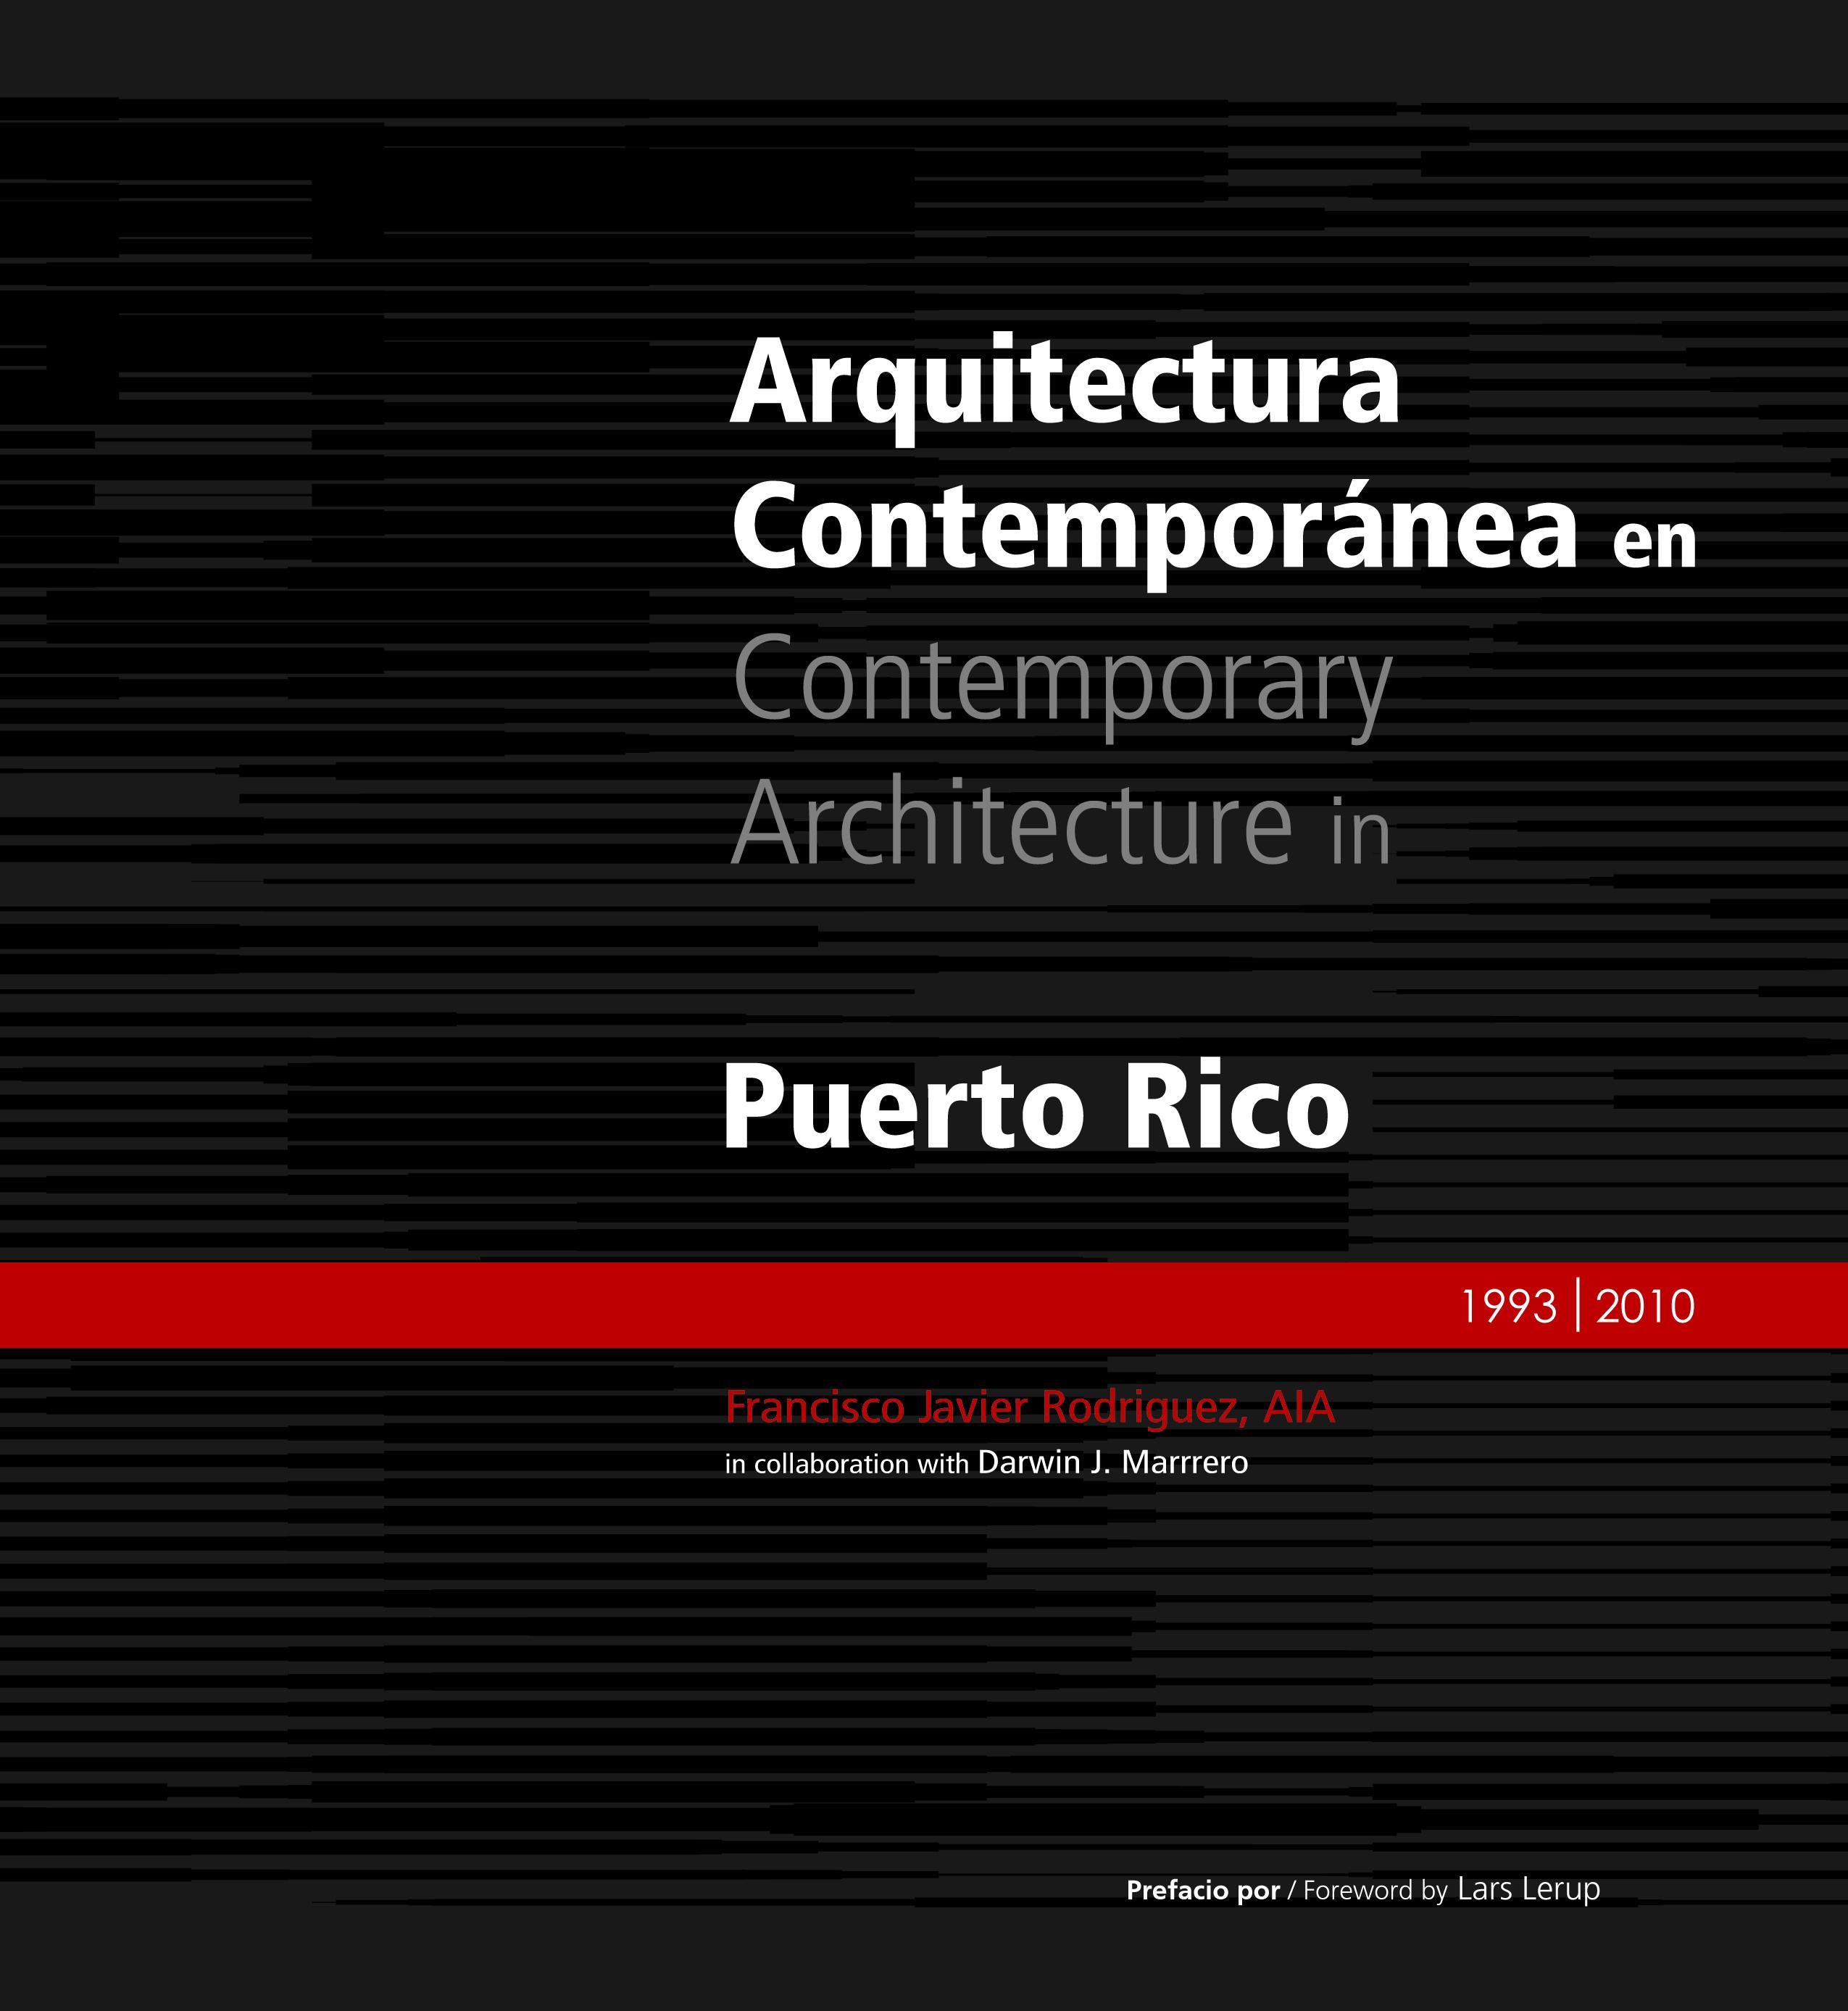 Catalogo de Arquitectura Contemporánea